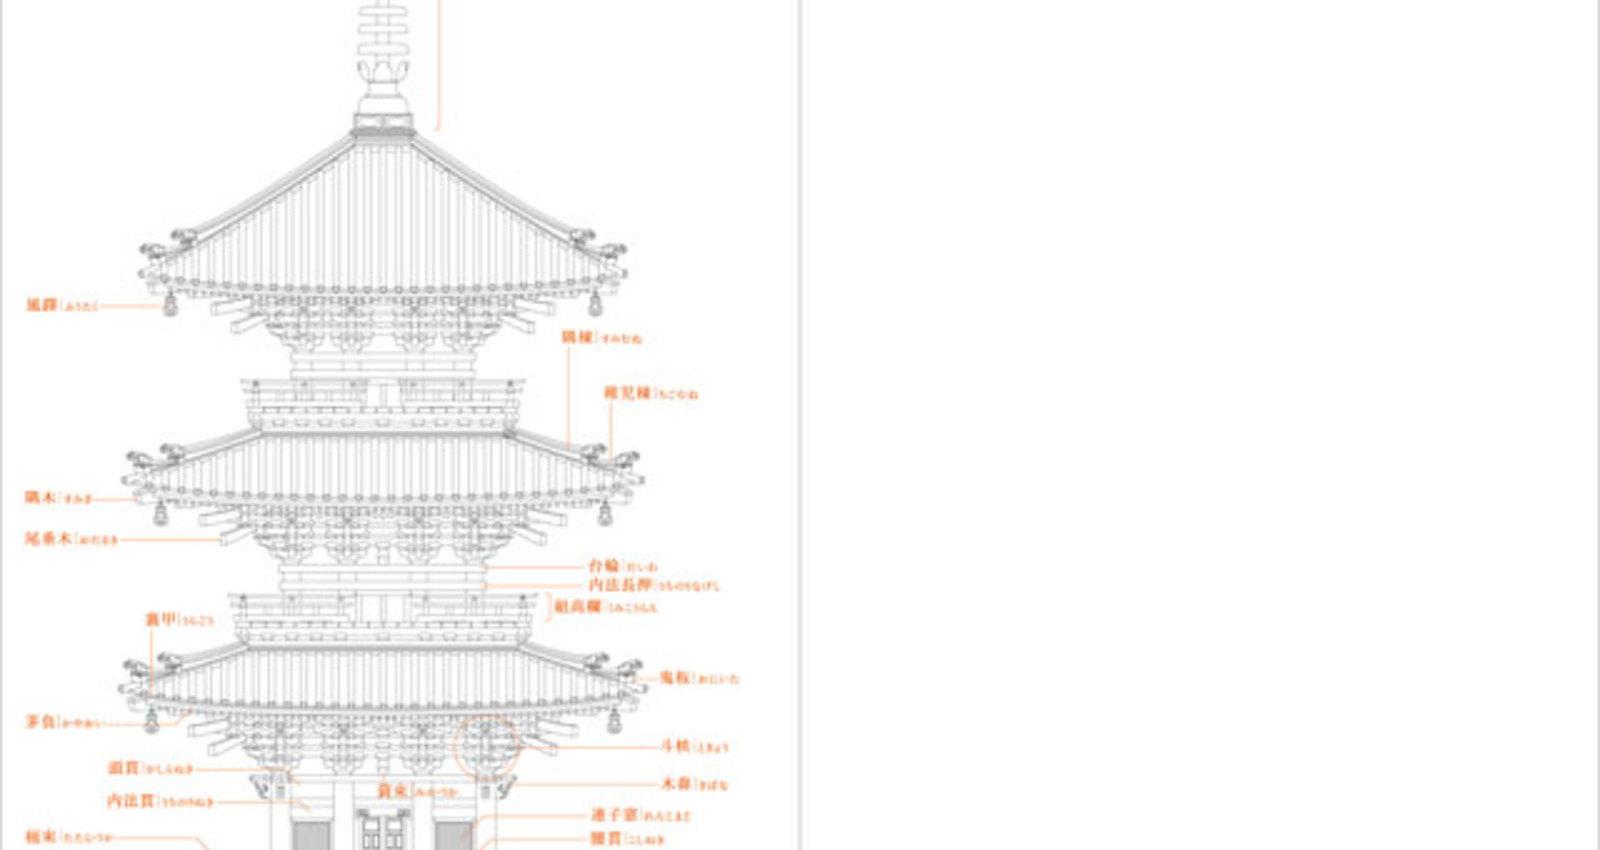 Chinzan-so Garden Pagoda